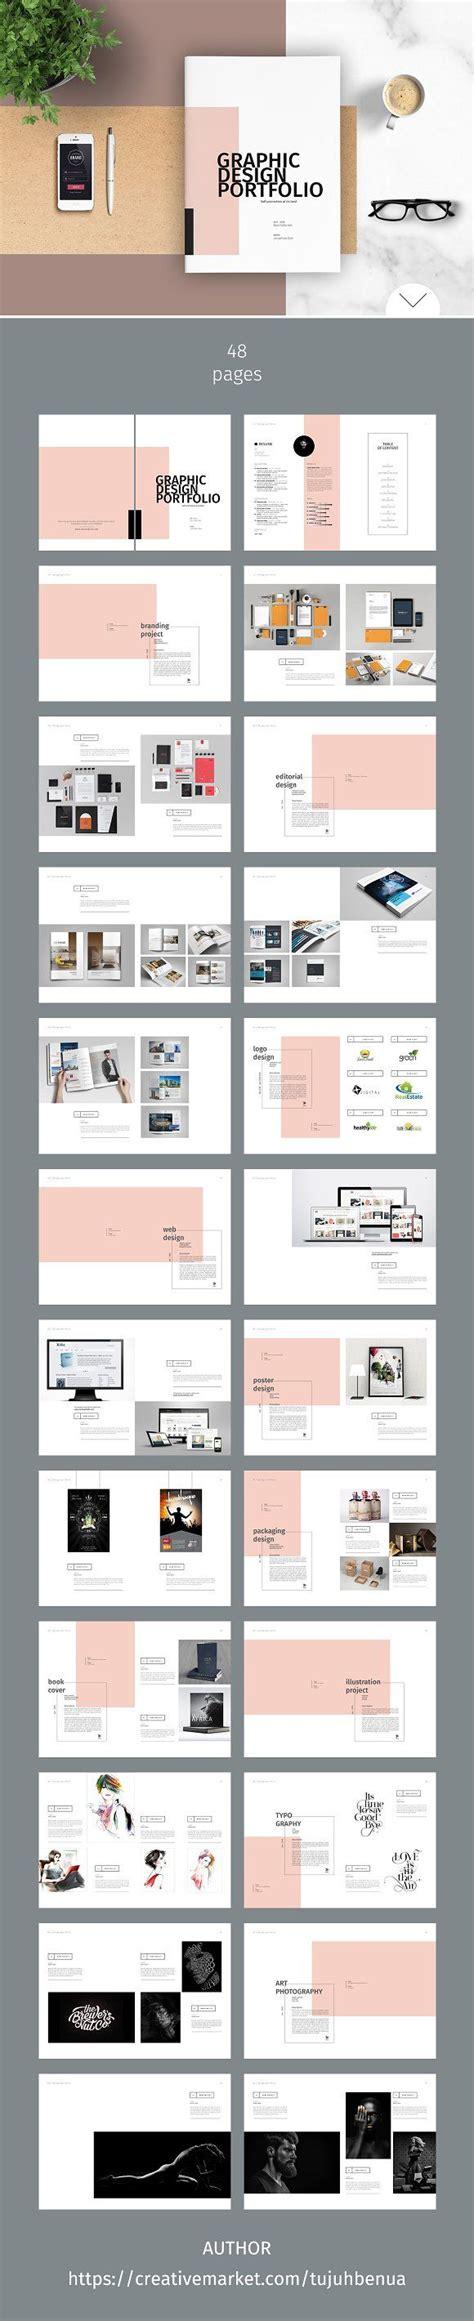 15130 architecture portfolio design layout architecture portfolio layout indesign interactive pdf